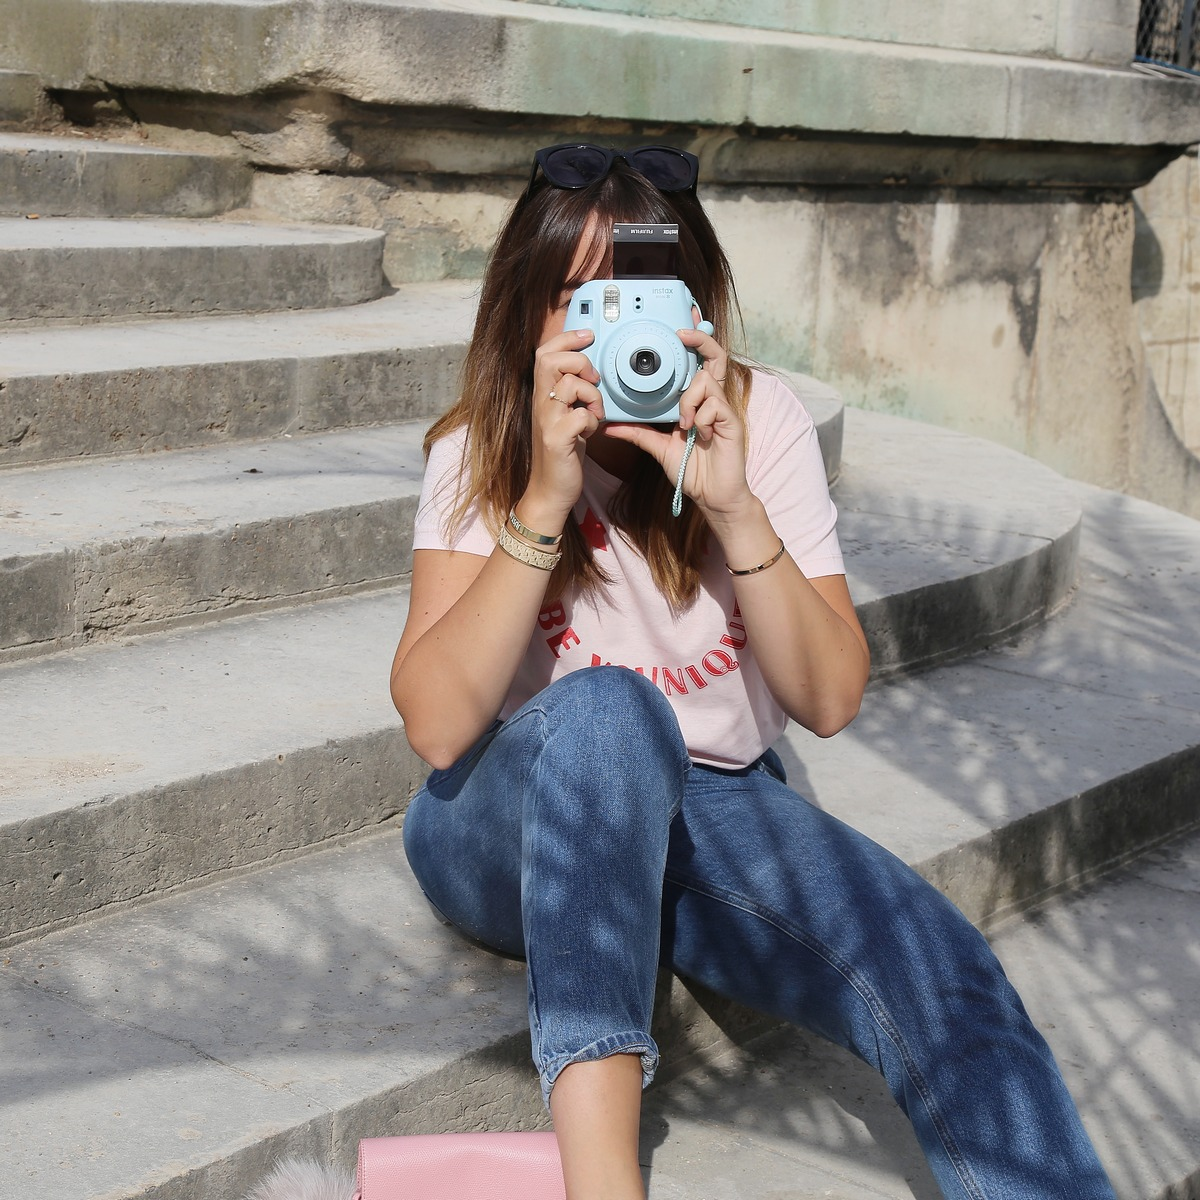 instax mini - instax bleu - polaroid